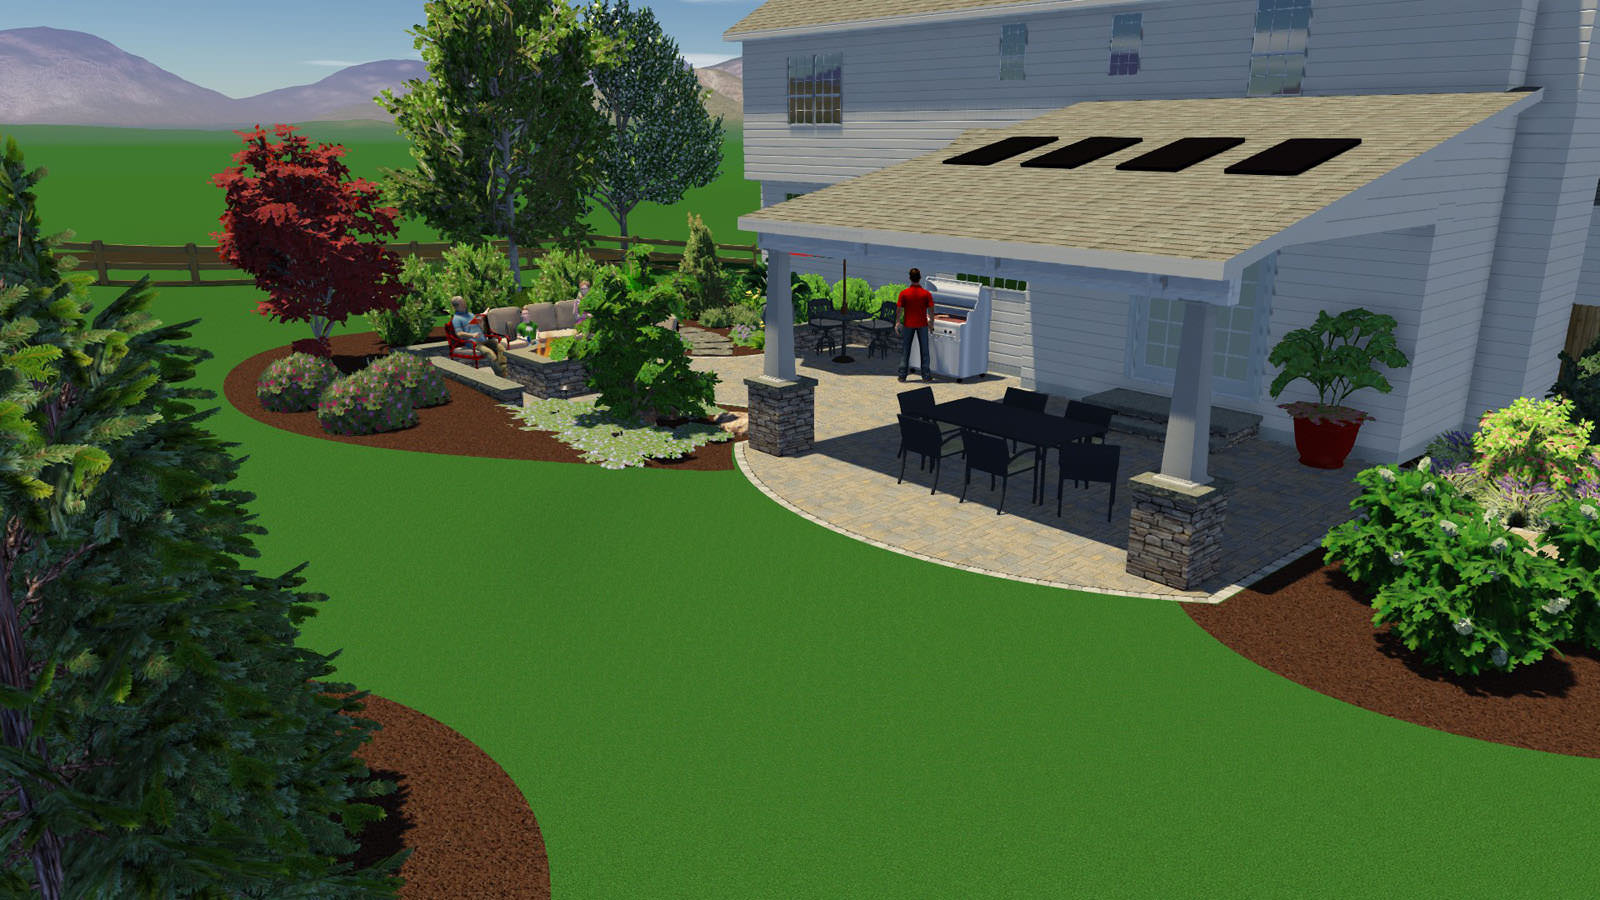 Stitt Residence « MasterPLAN Outdoor Living on Masterplan Outdoor Living id=94253